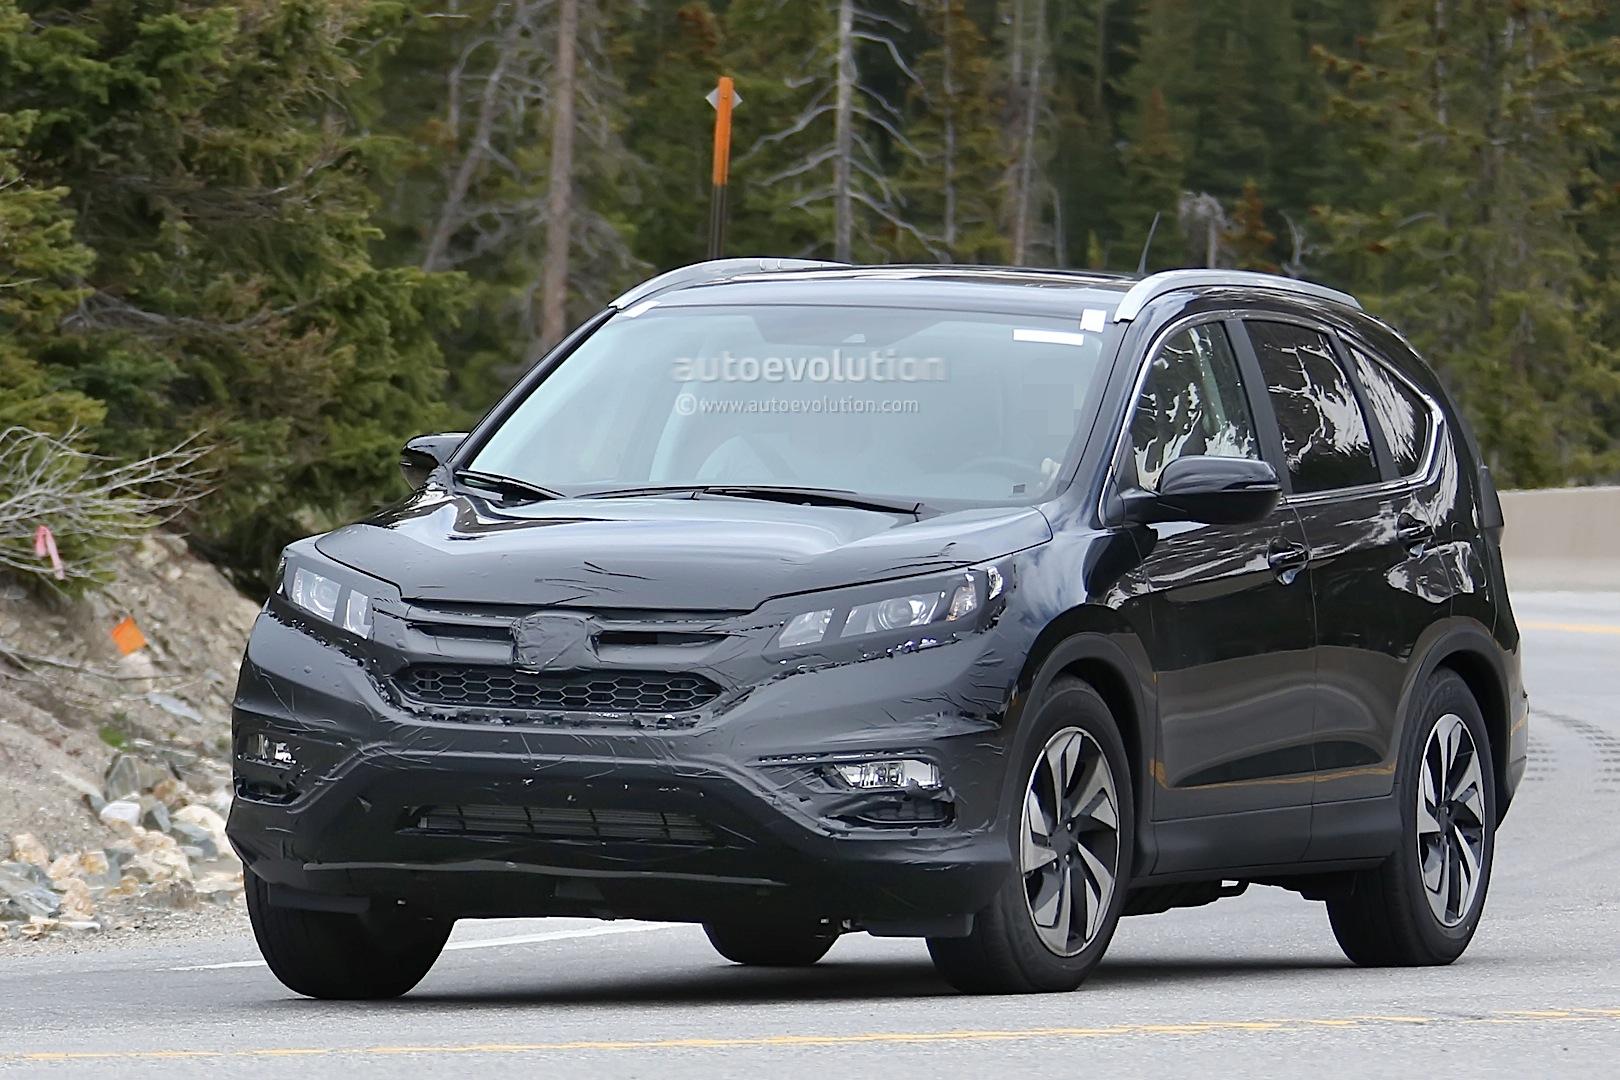 2014 Honda Accord For Sale >> Spyshots: 2016 Honda CR-V Facelift Testing in the US ...